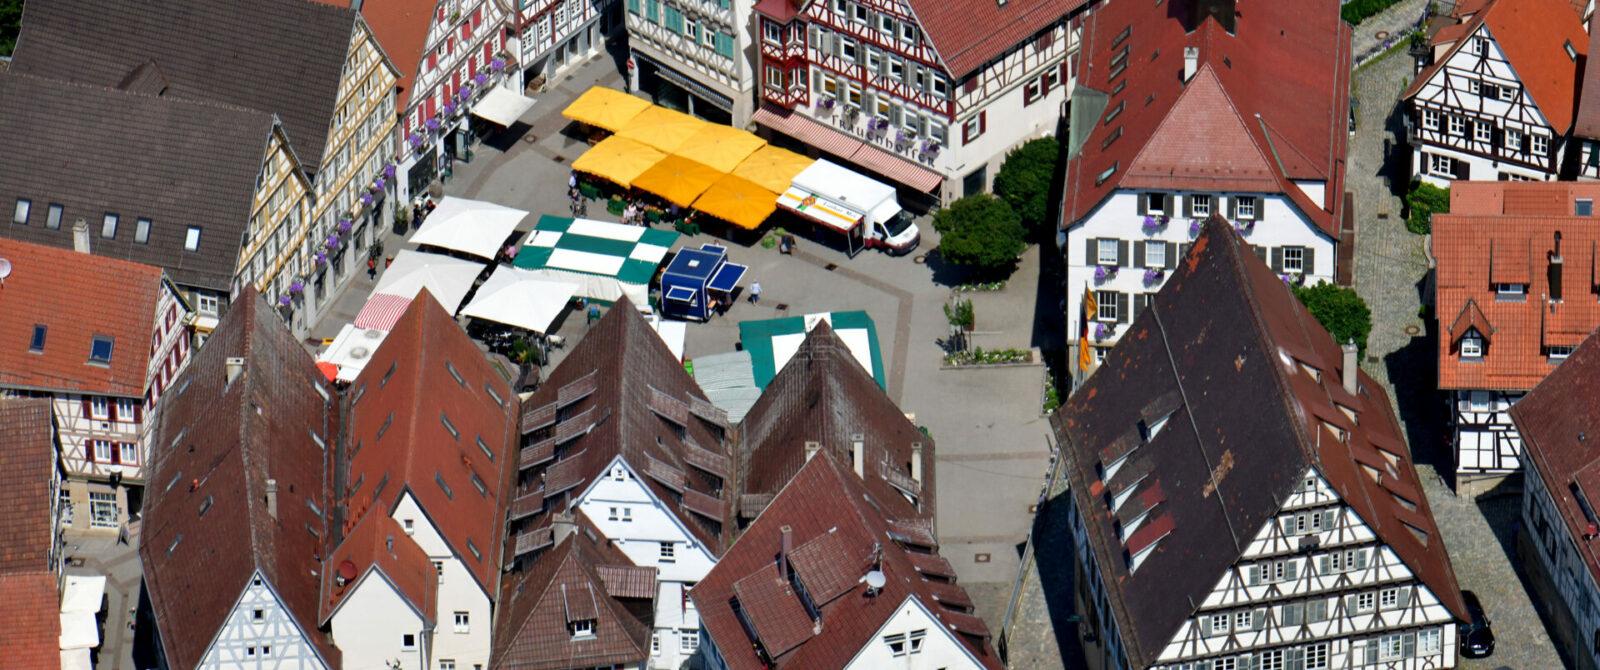 Luftbild Herrenberg Altstadt Marktplatz / Foto: Holom